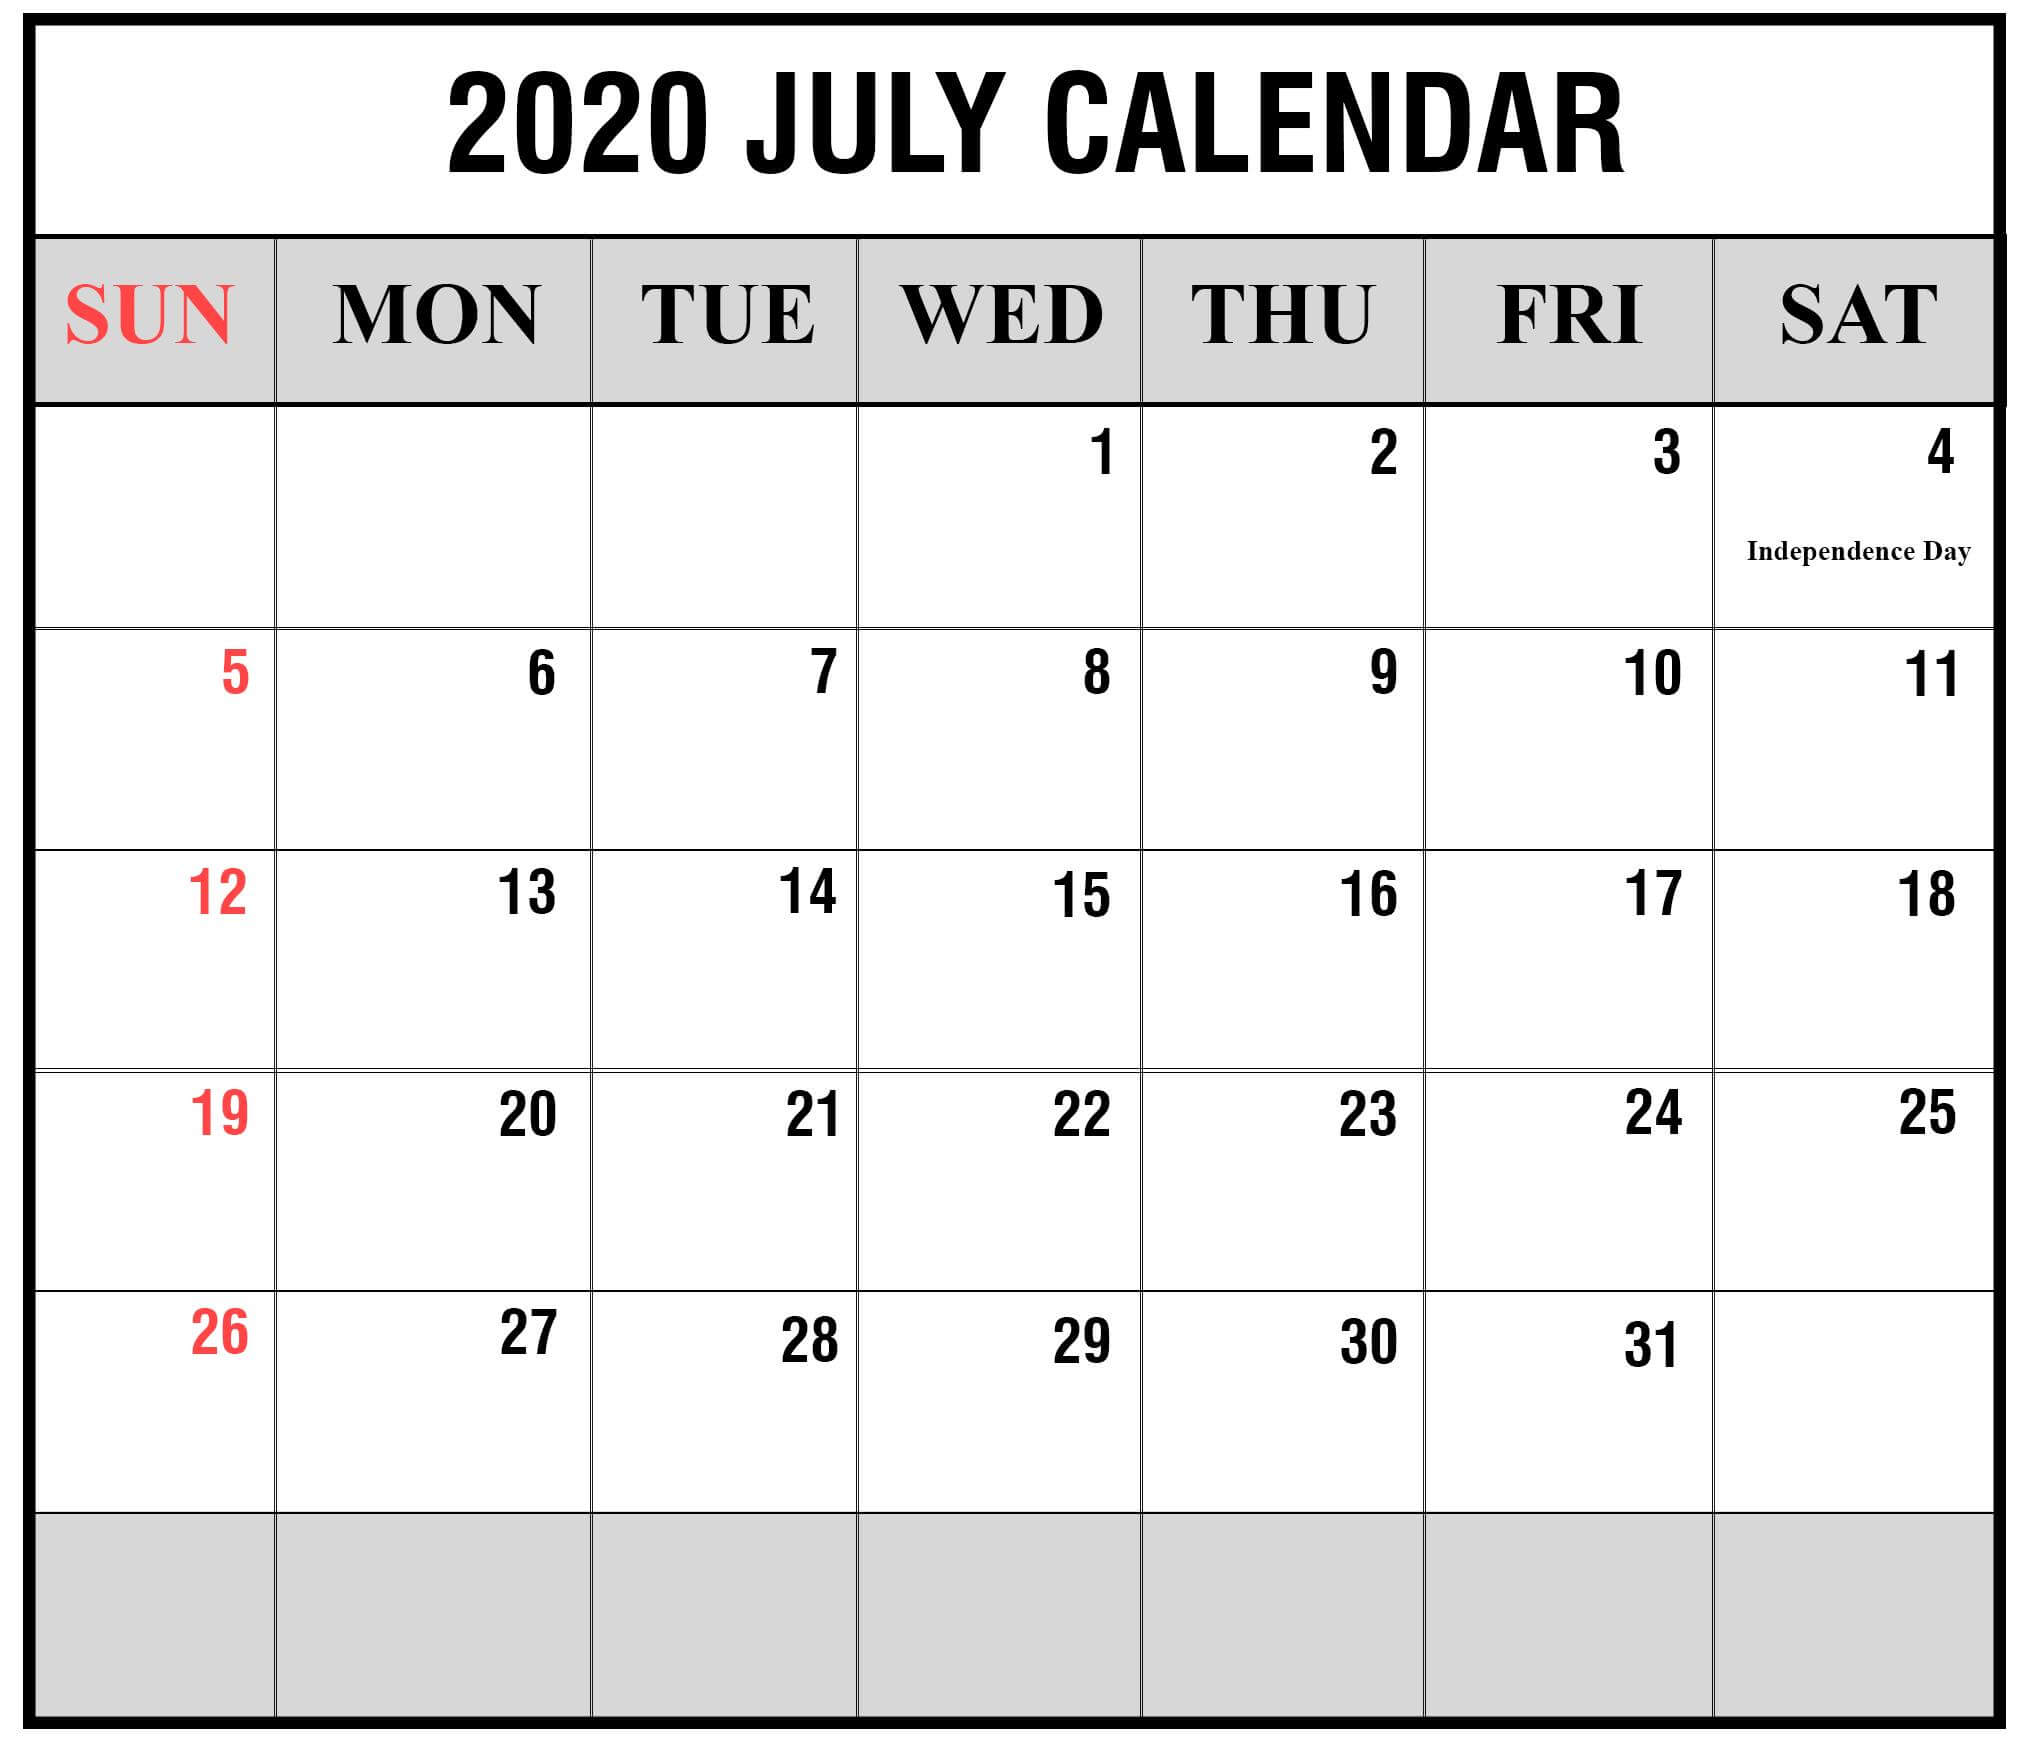 July 2020 Holidays Calendar